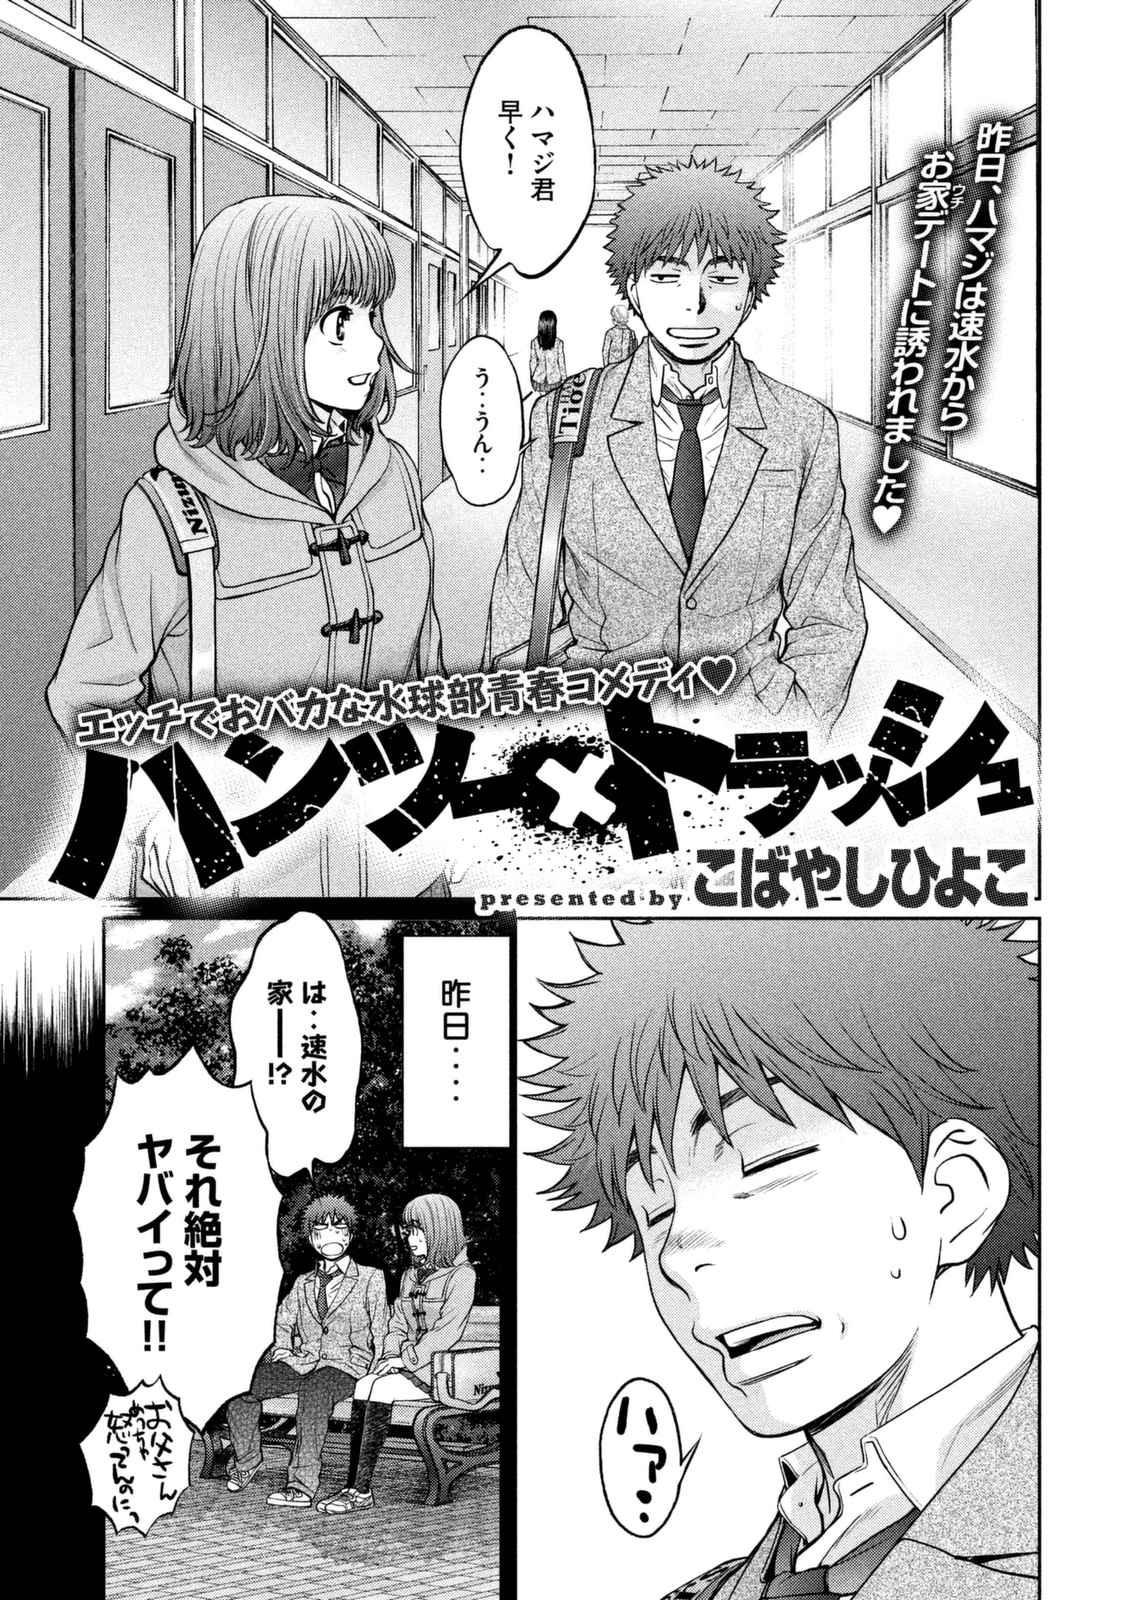 Hantsu x Trash - Chapter 145 - Page 1